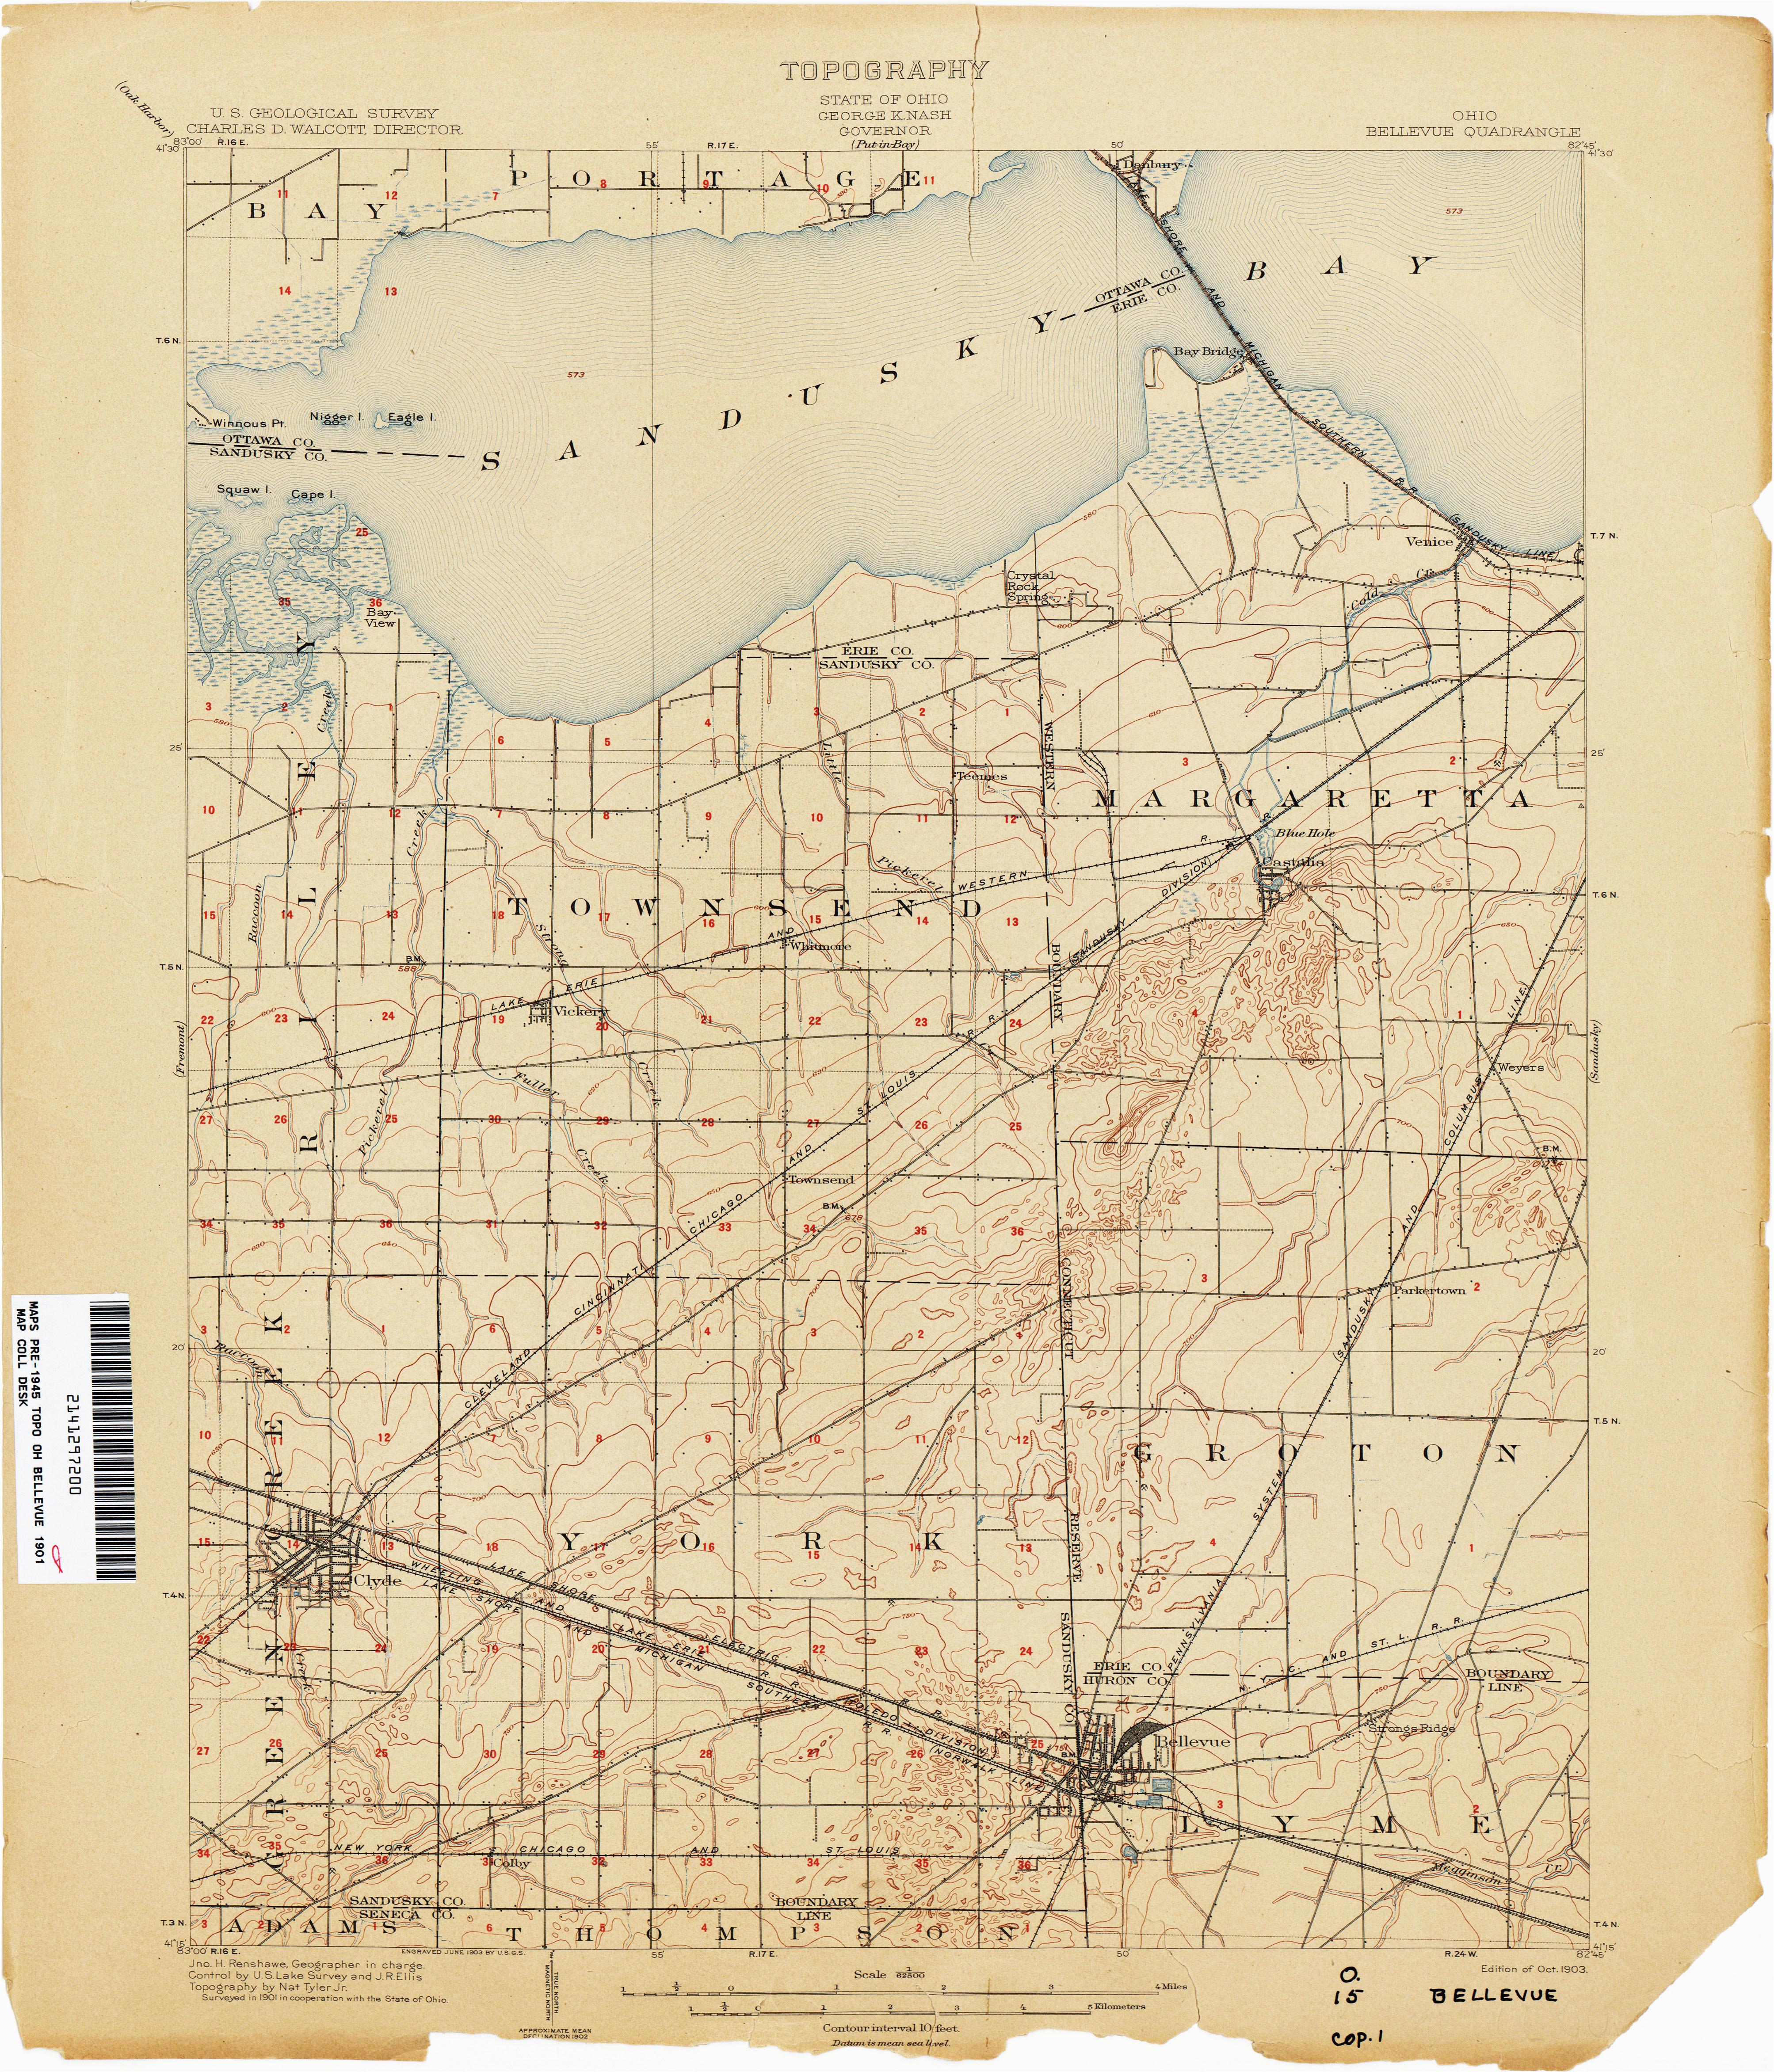 Sandusky Ohio Street Map Ohio Historical topographic Maps Perry Castaa Eda Map Collection